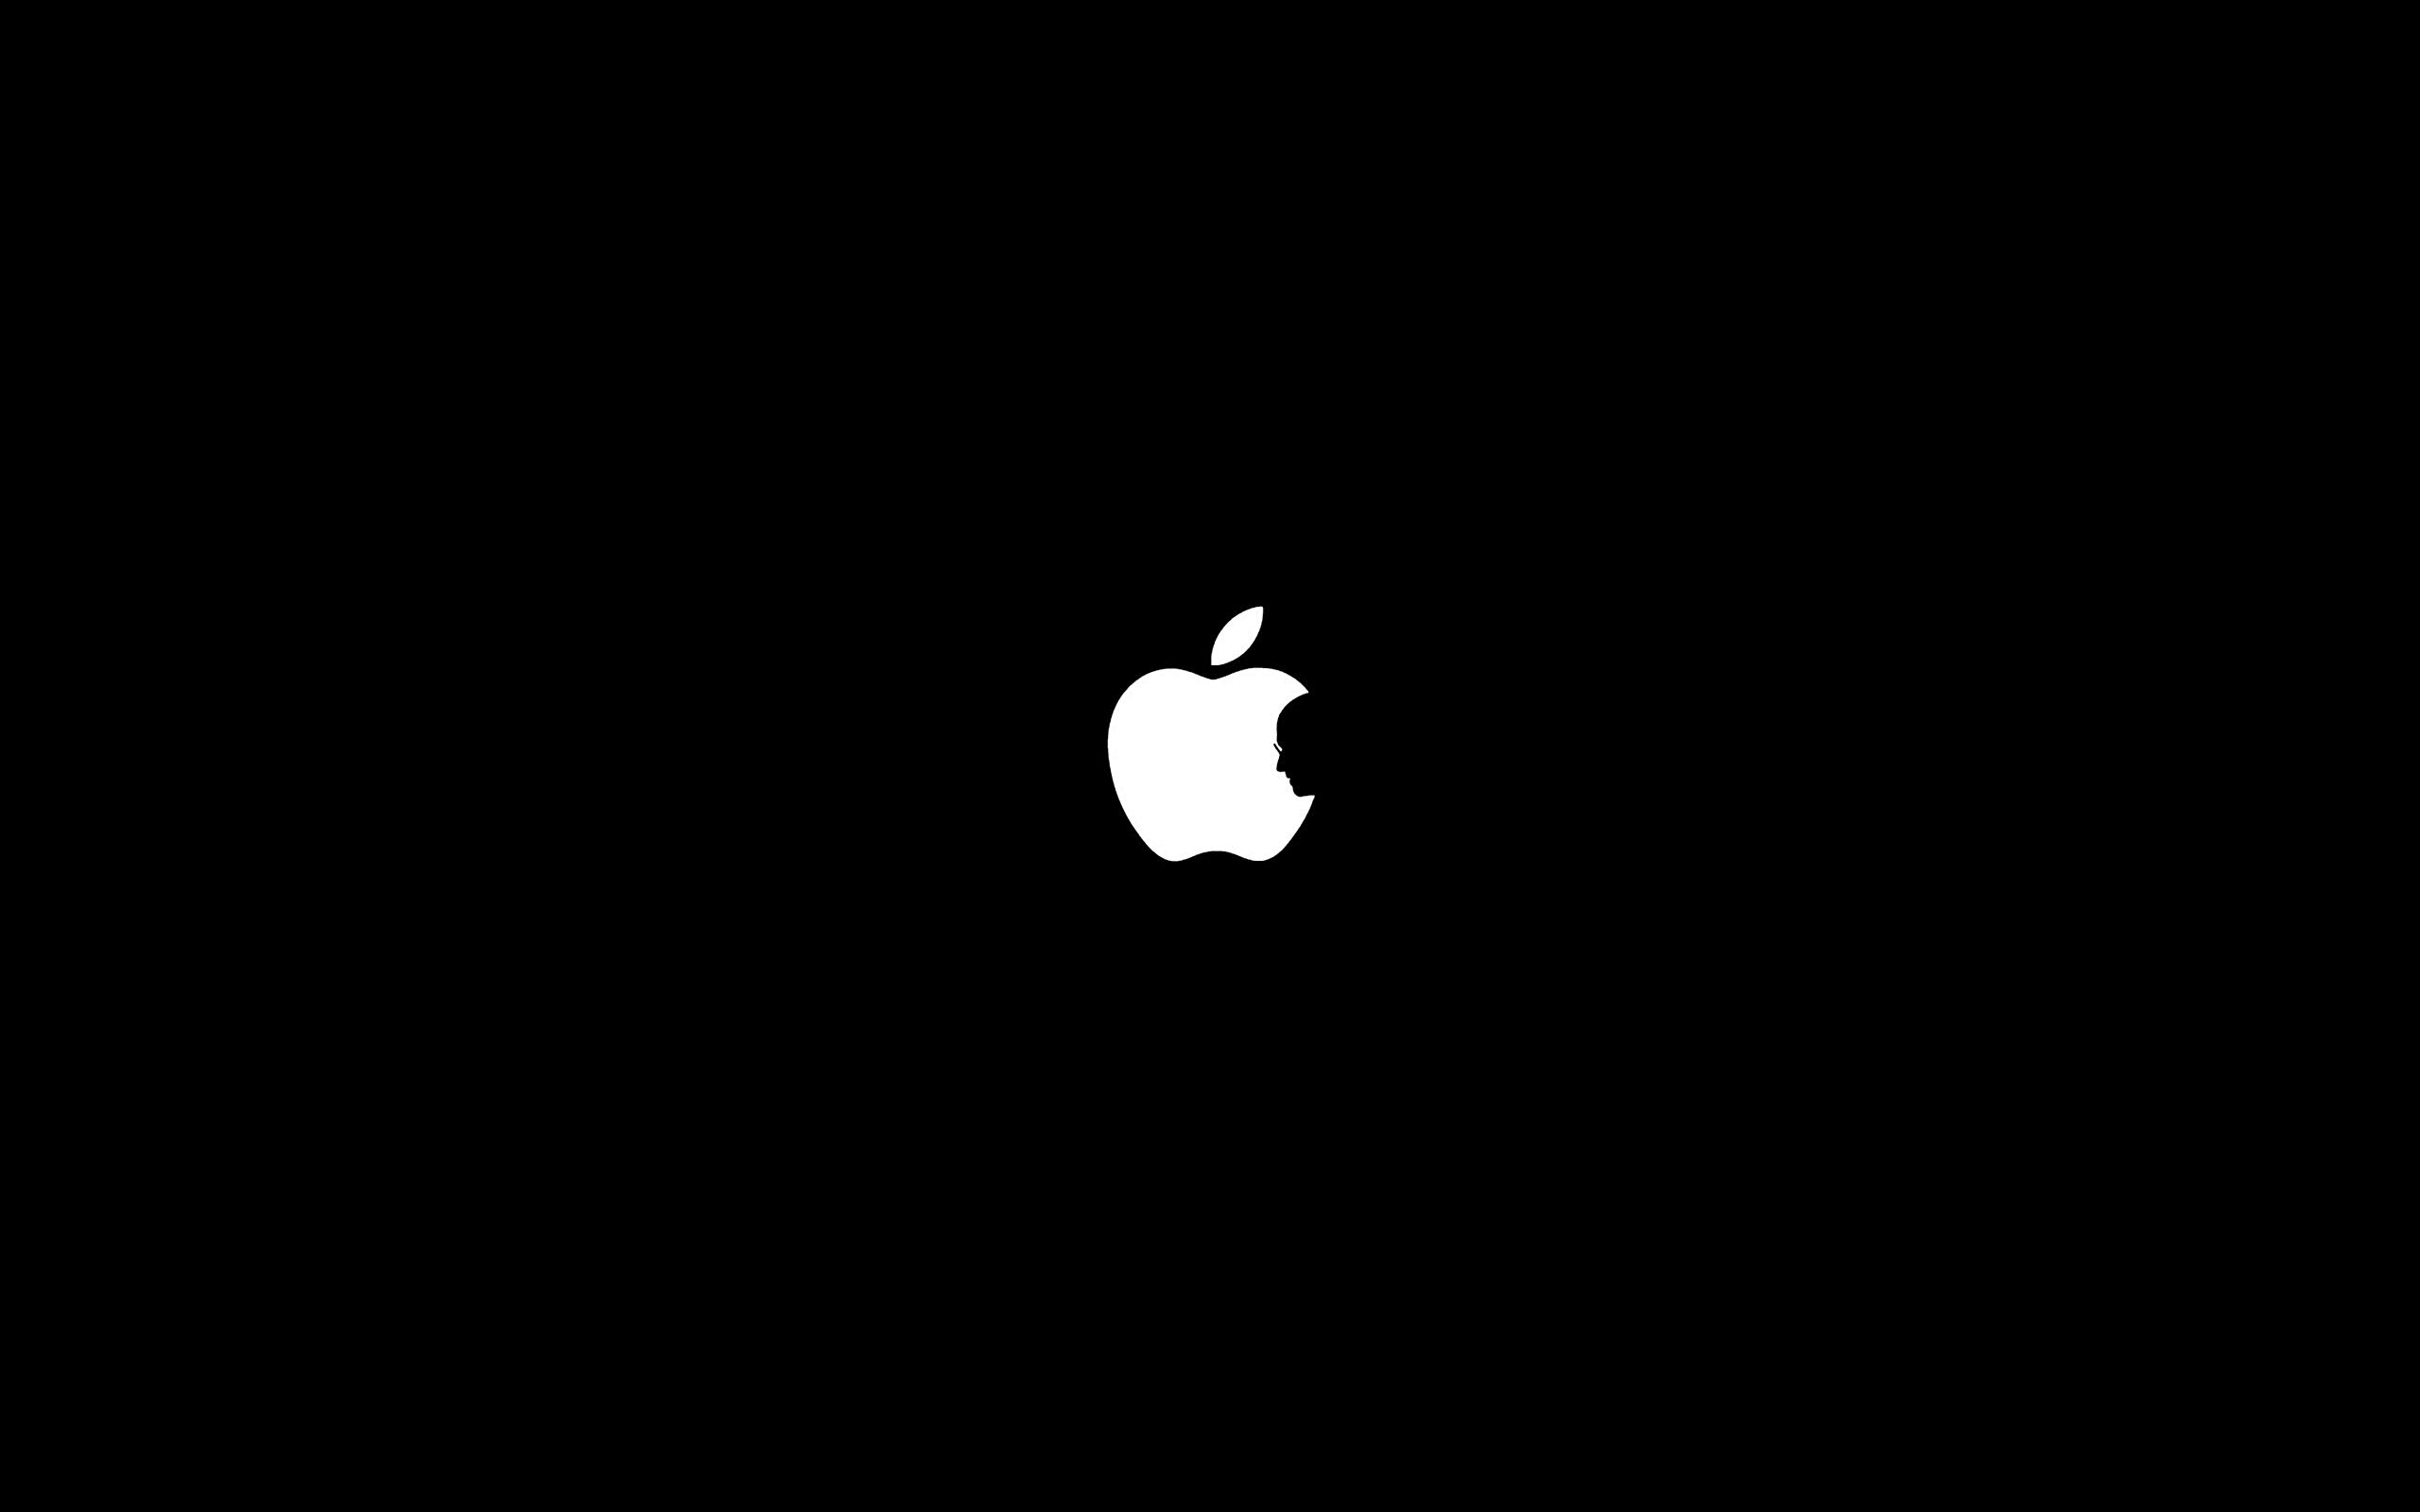 Профиль Стива Джобса в яблоке